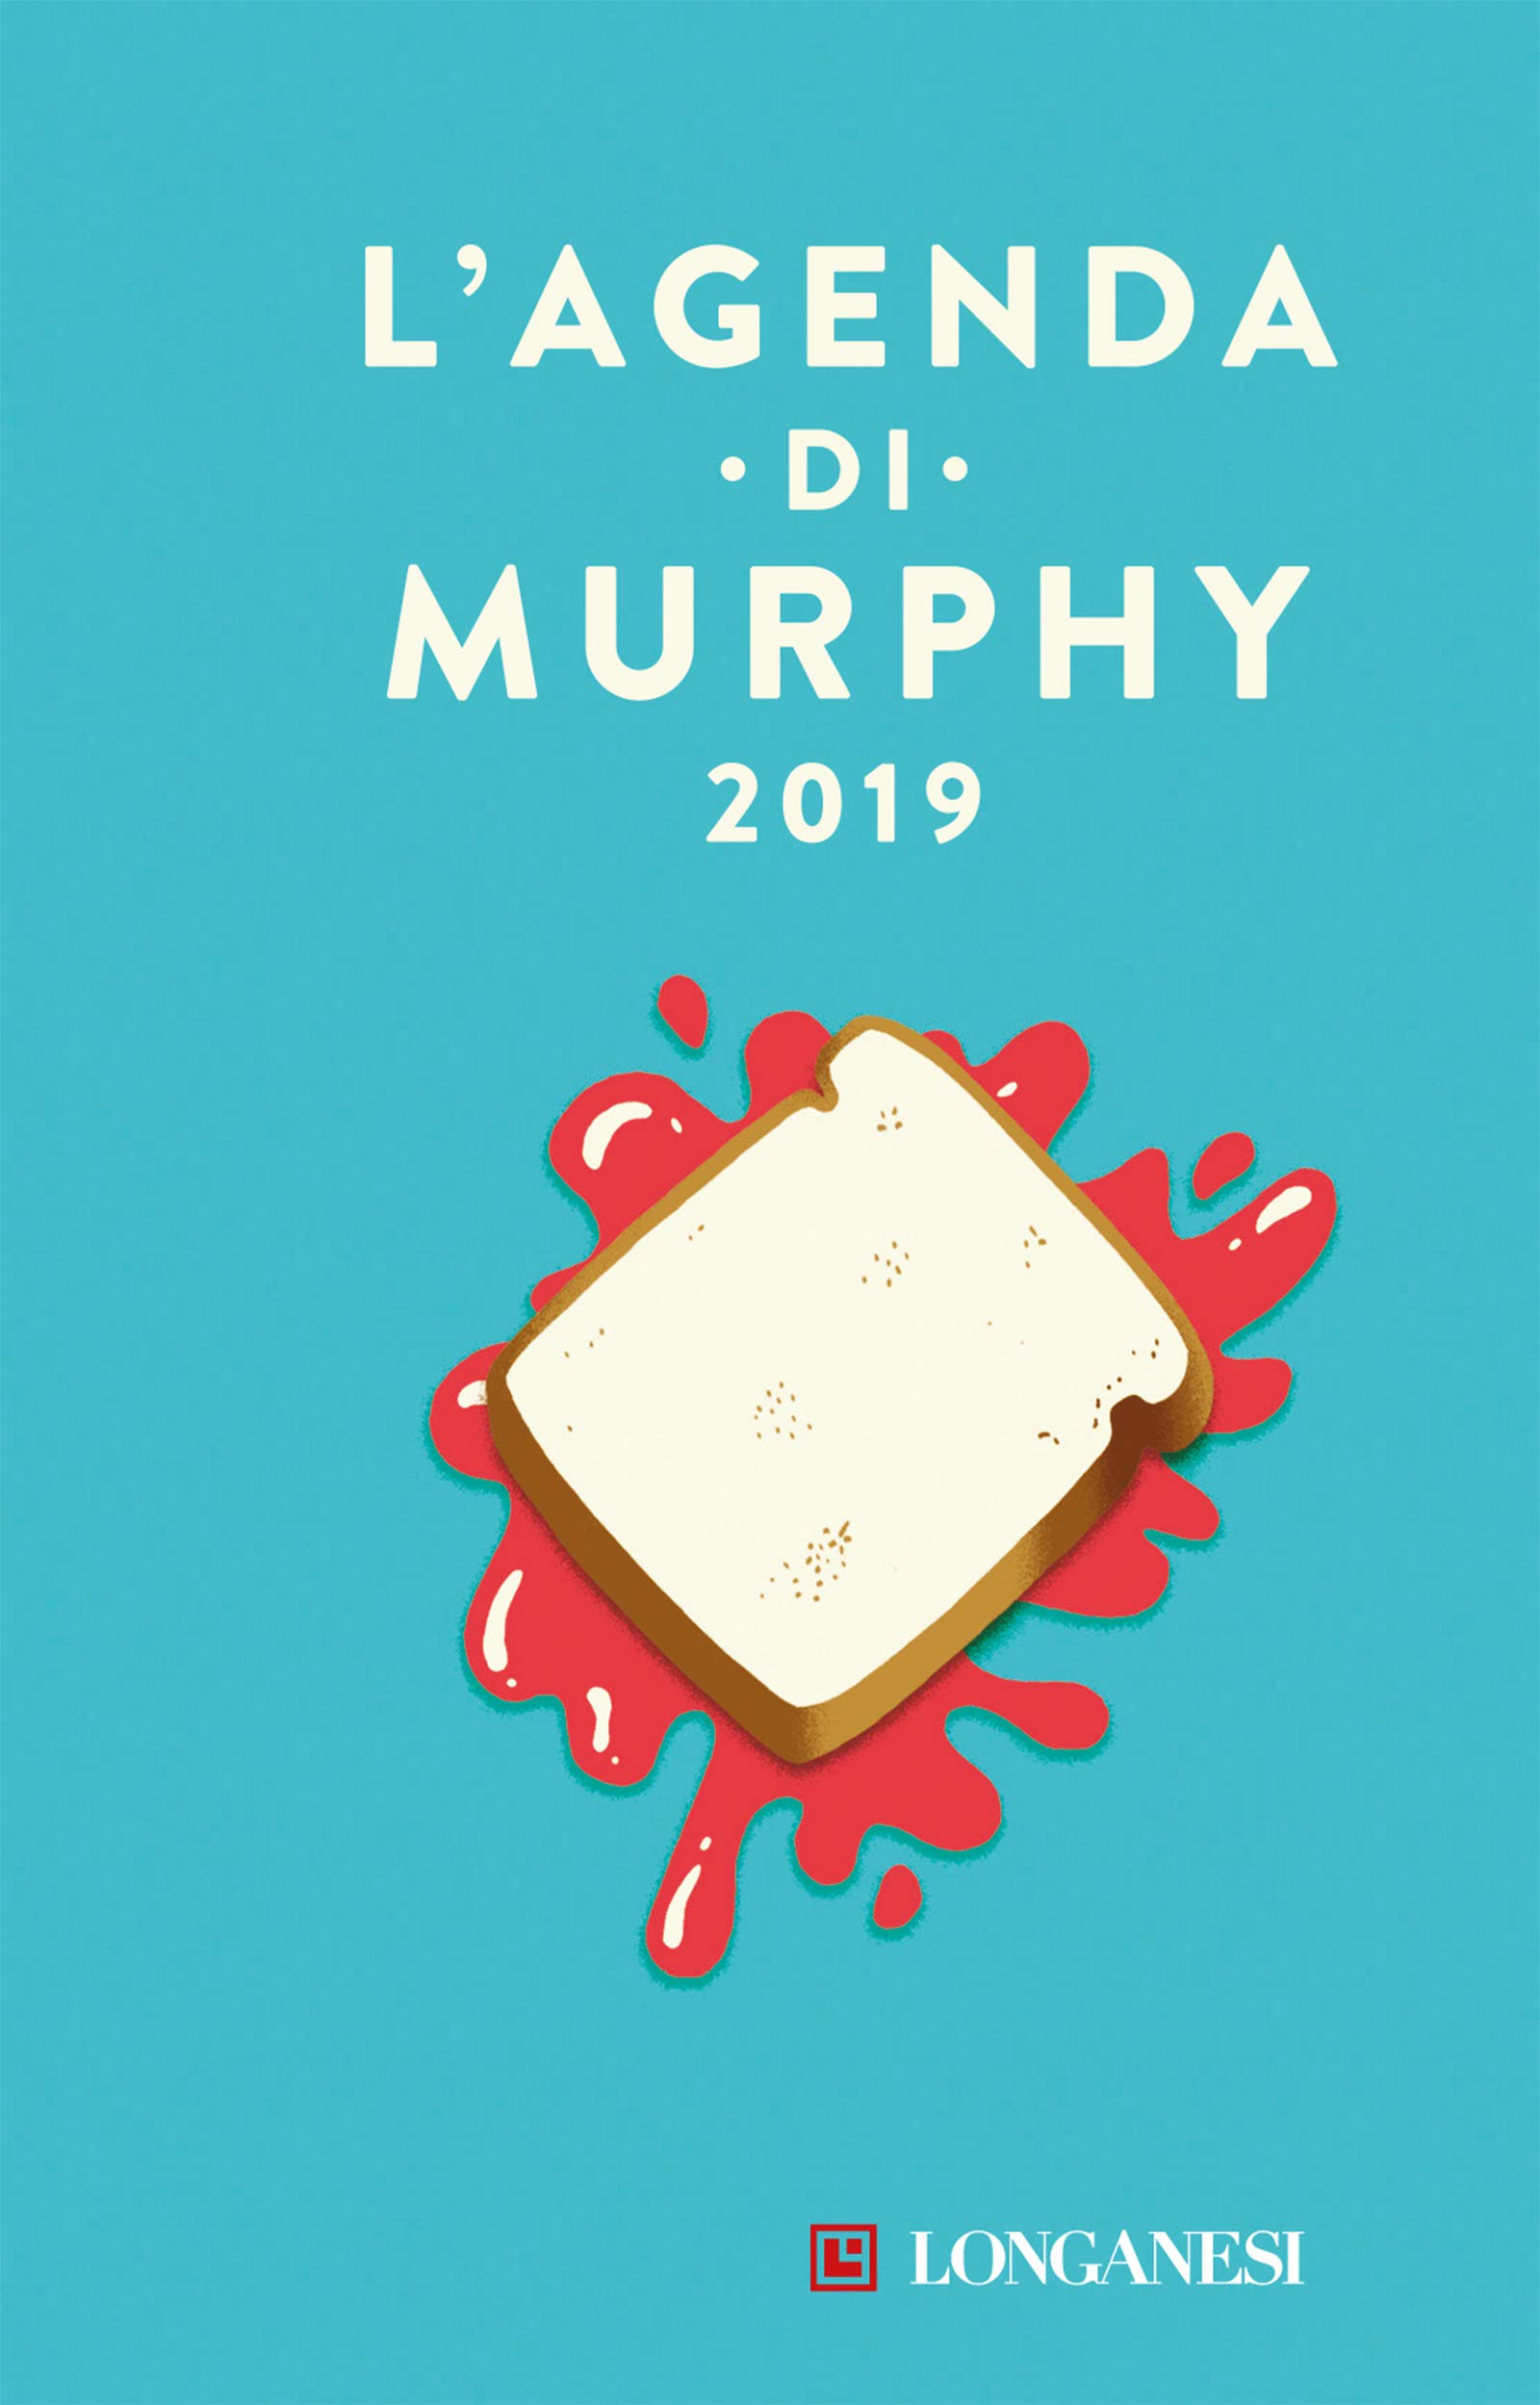 Lagenda di Murphy 2019 (La piccola Gaja scienza): Amazon.es ...